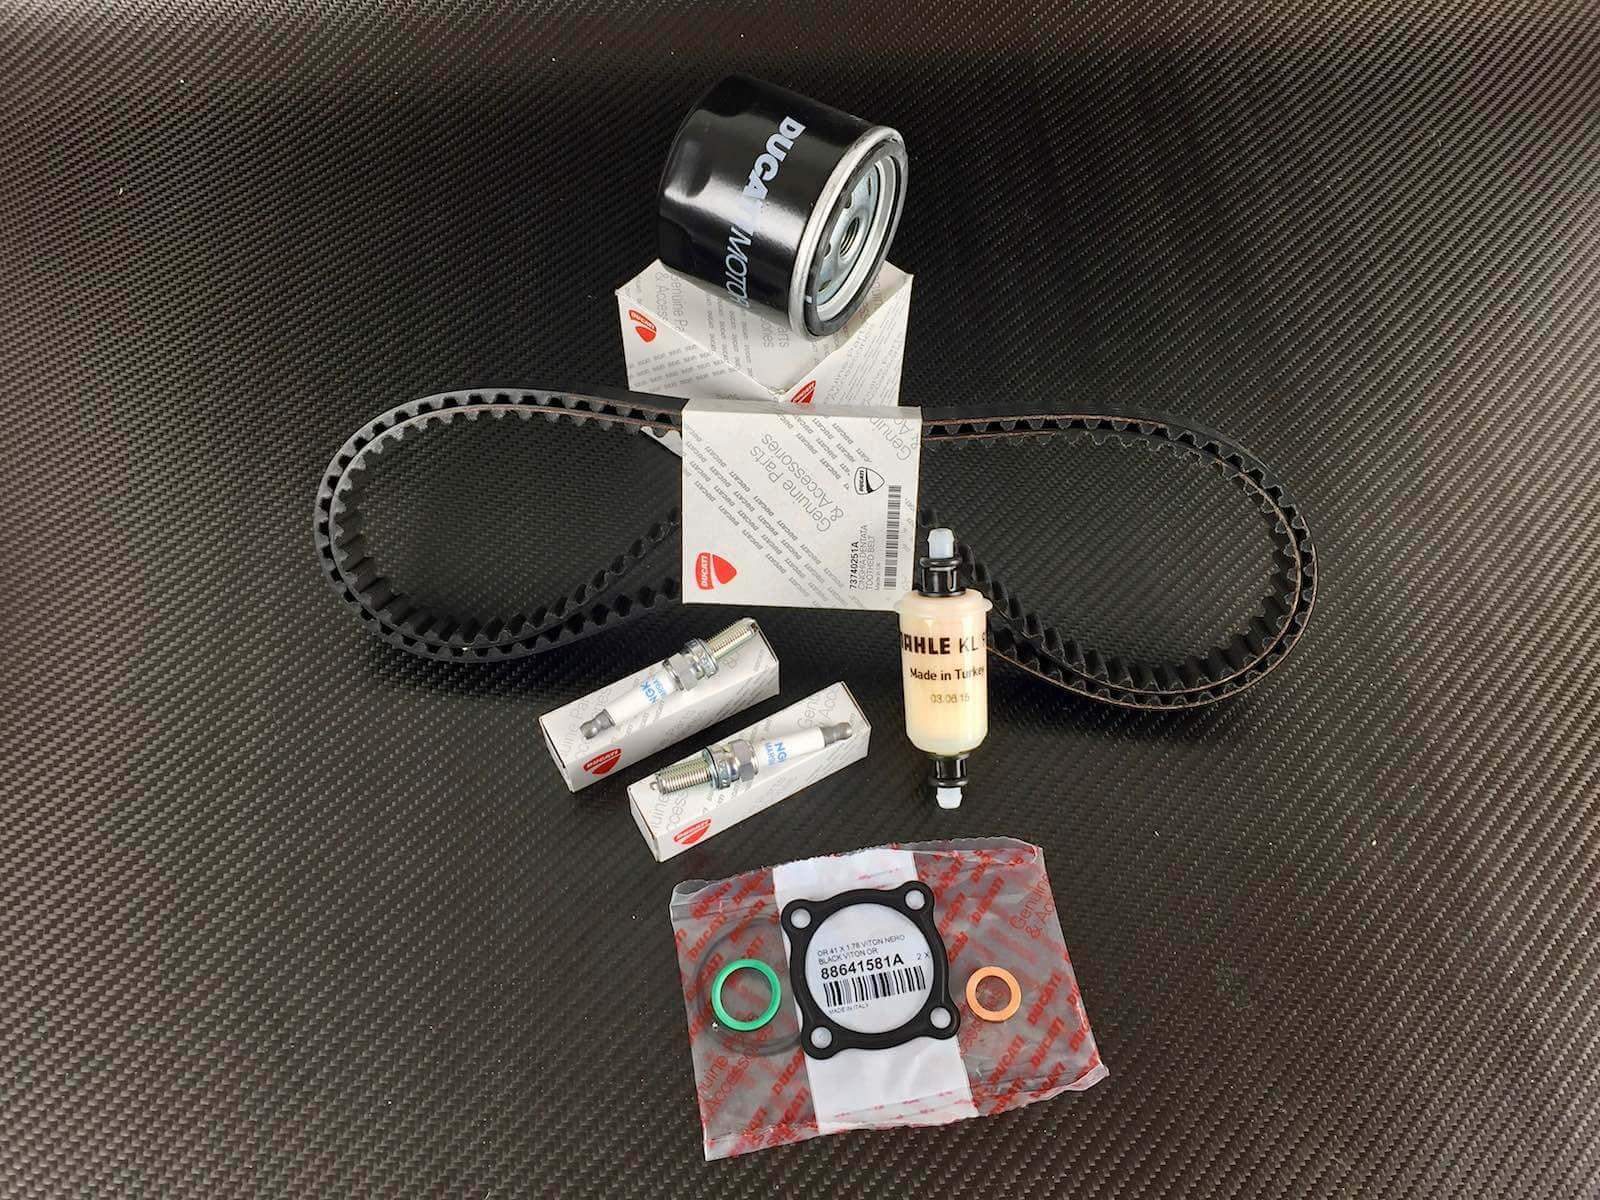 ducati diavel service kit; cam timing belts, oil-, fuel filter